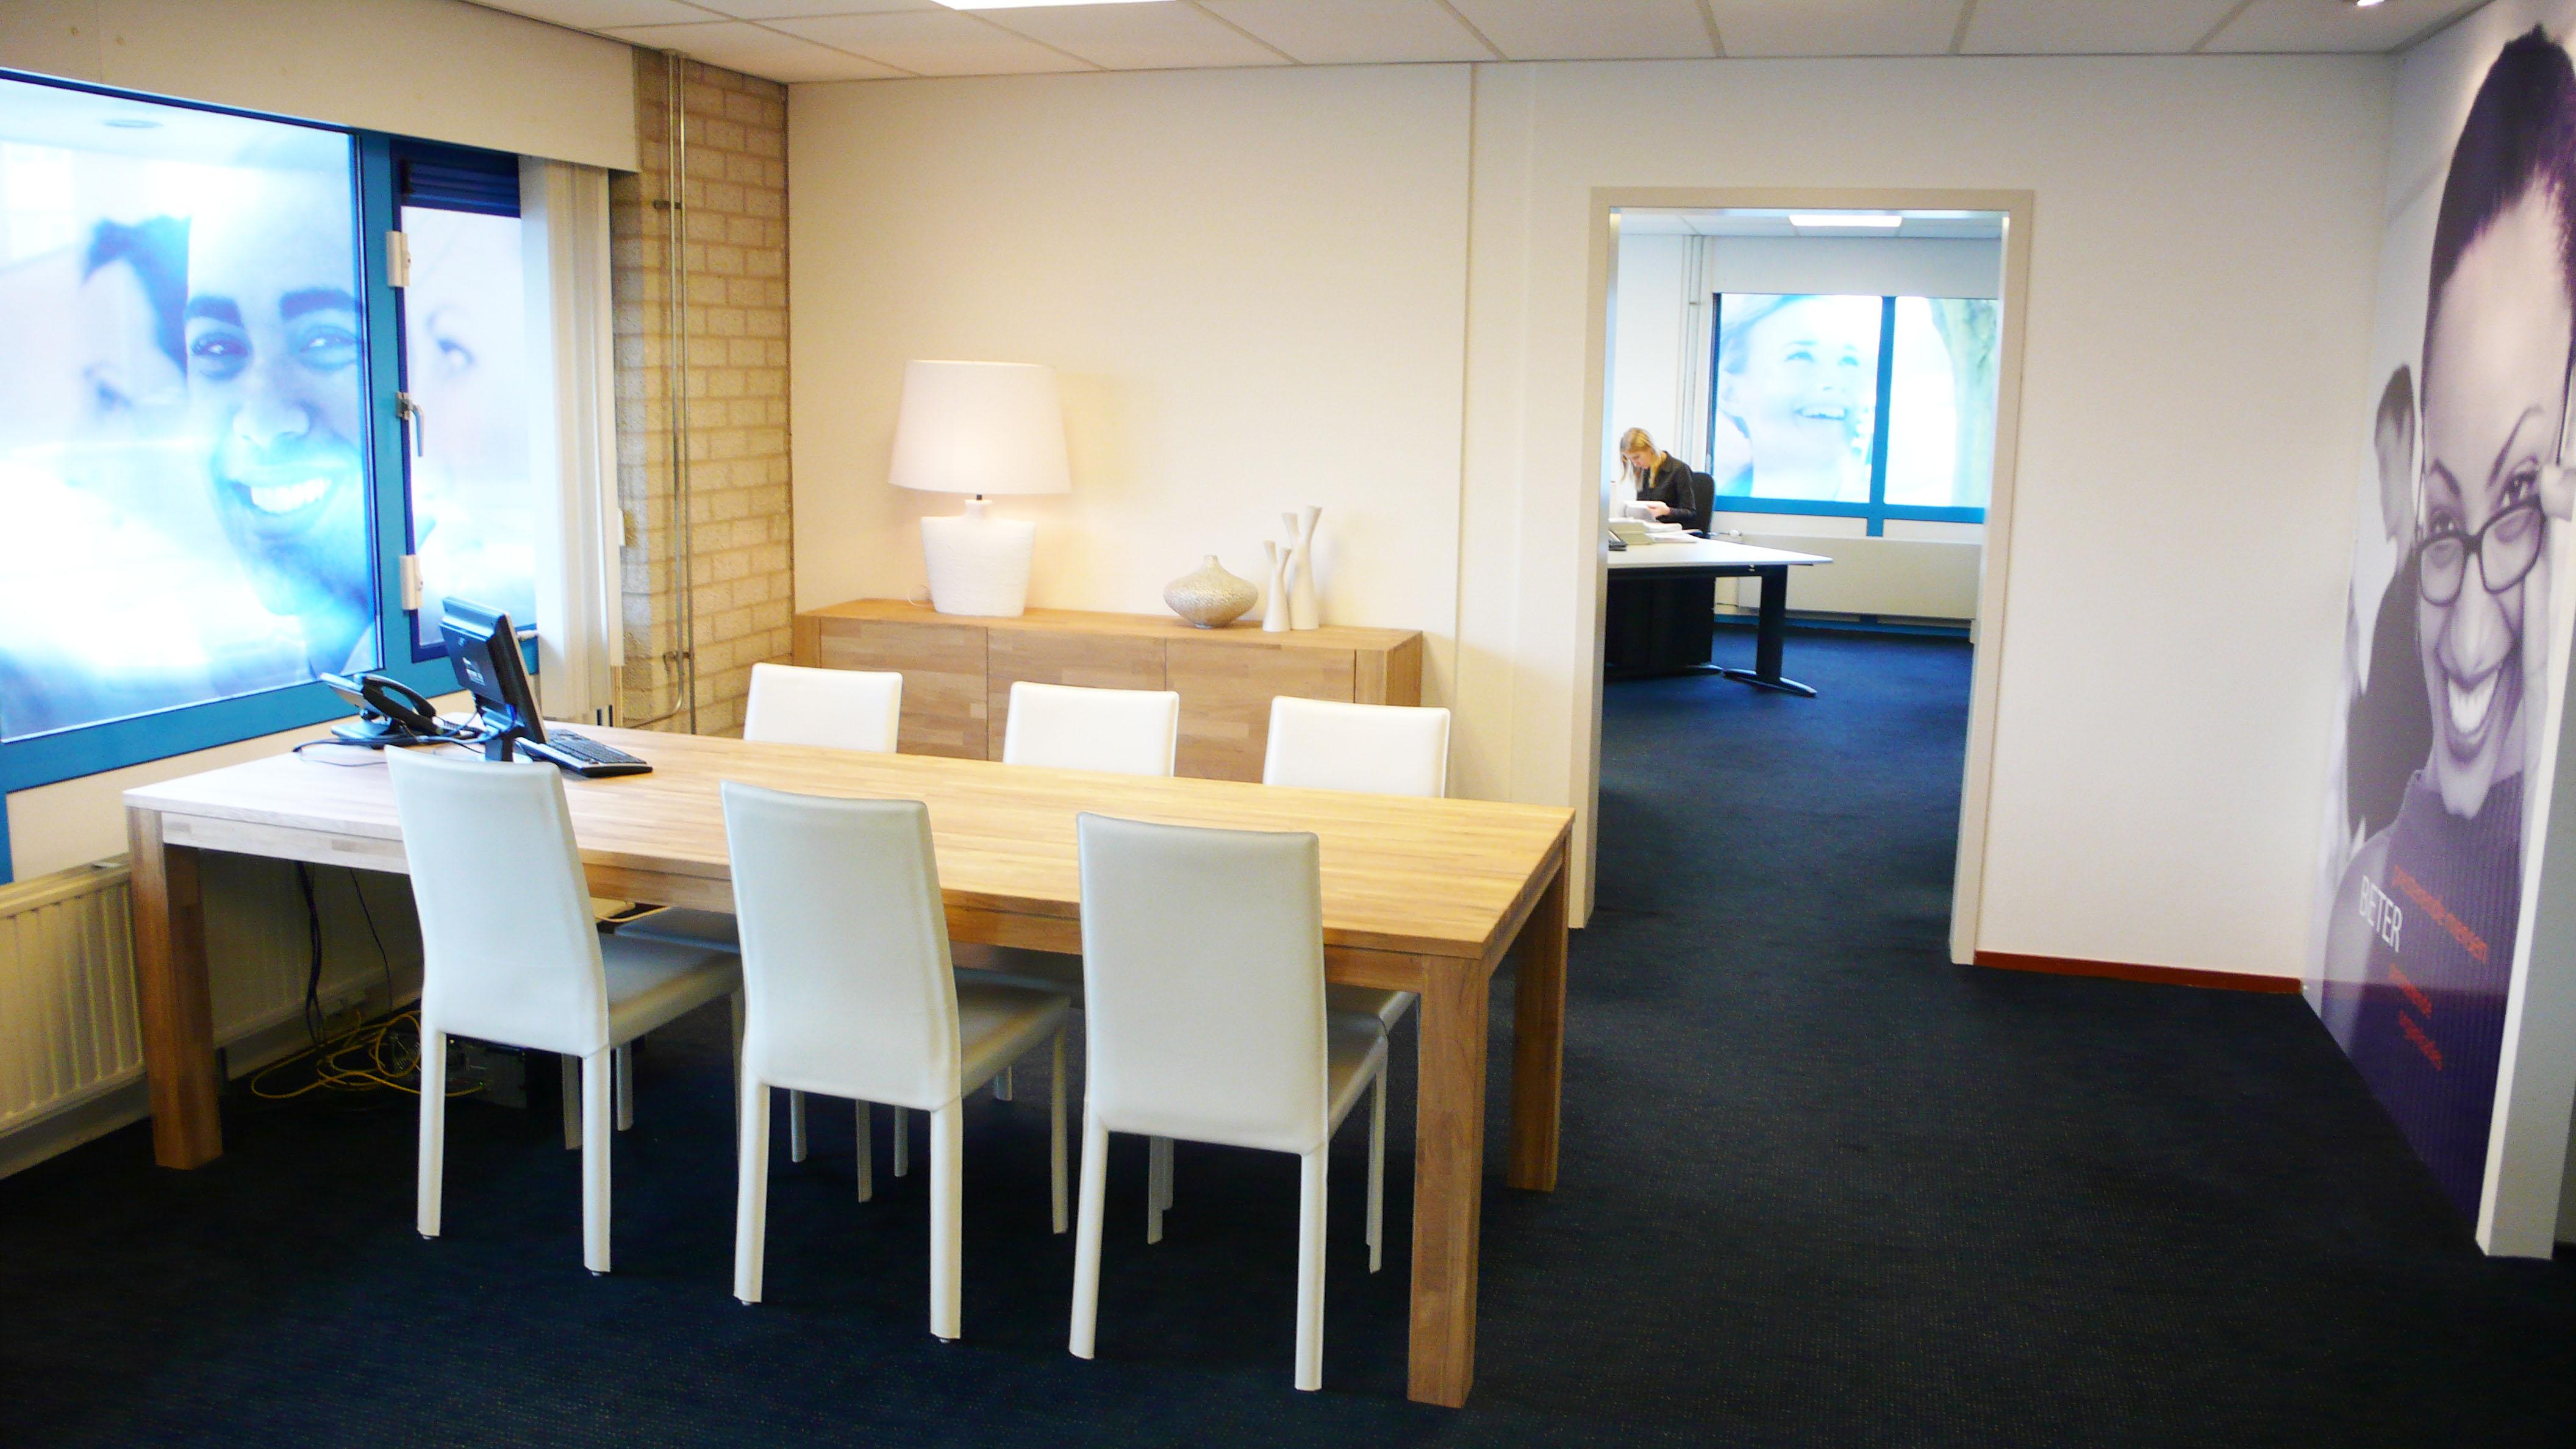 Elycio talen paul paternotte for Design appartement zwitserland